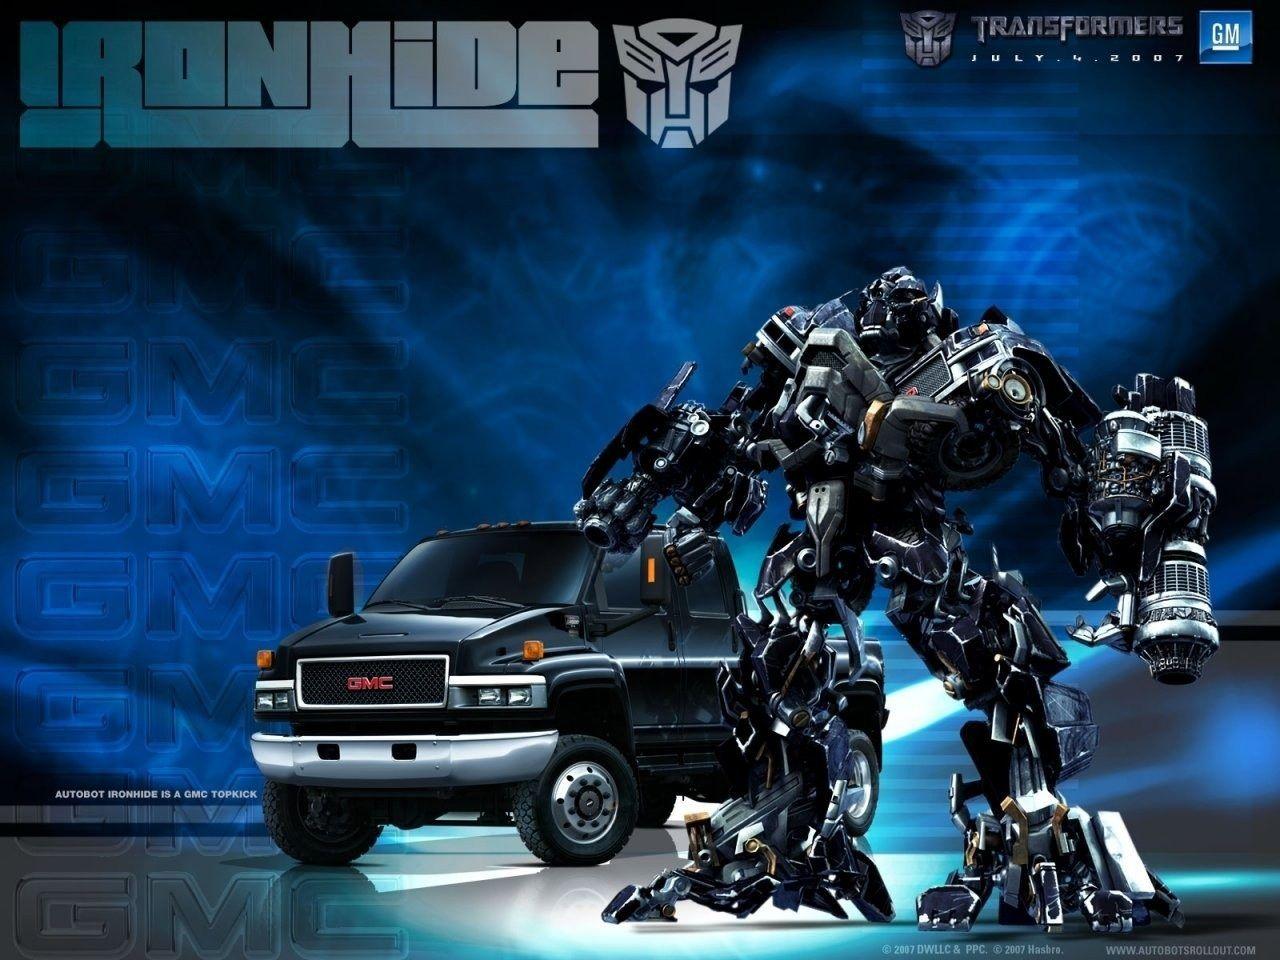 Ironhide Transformers Wallpaper Ironhide Autobots Transformers Filme Transformers Transformers